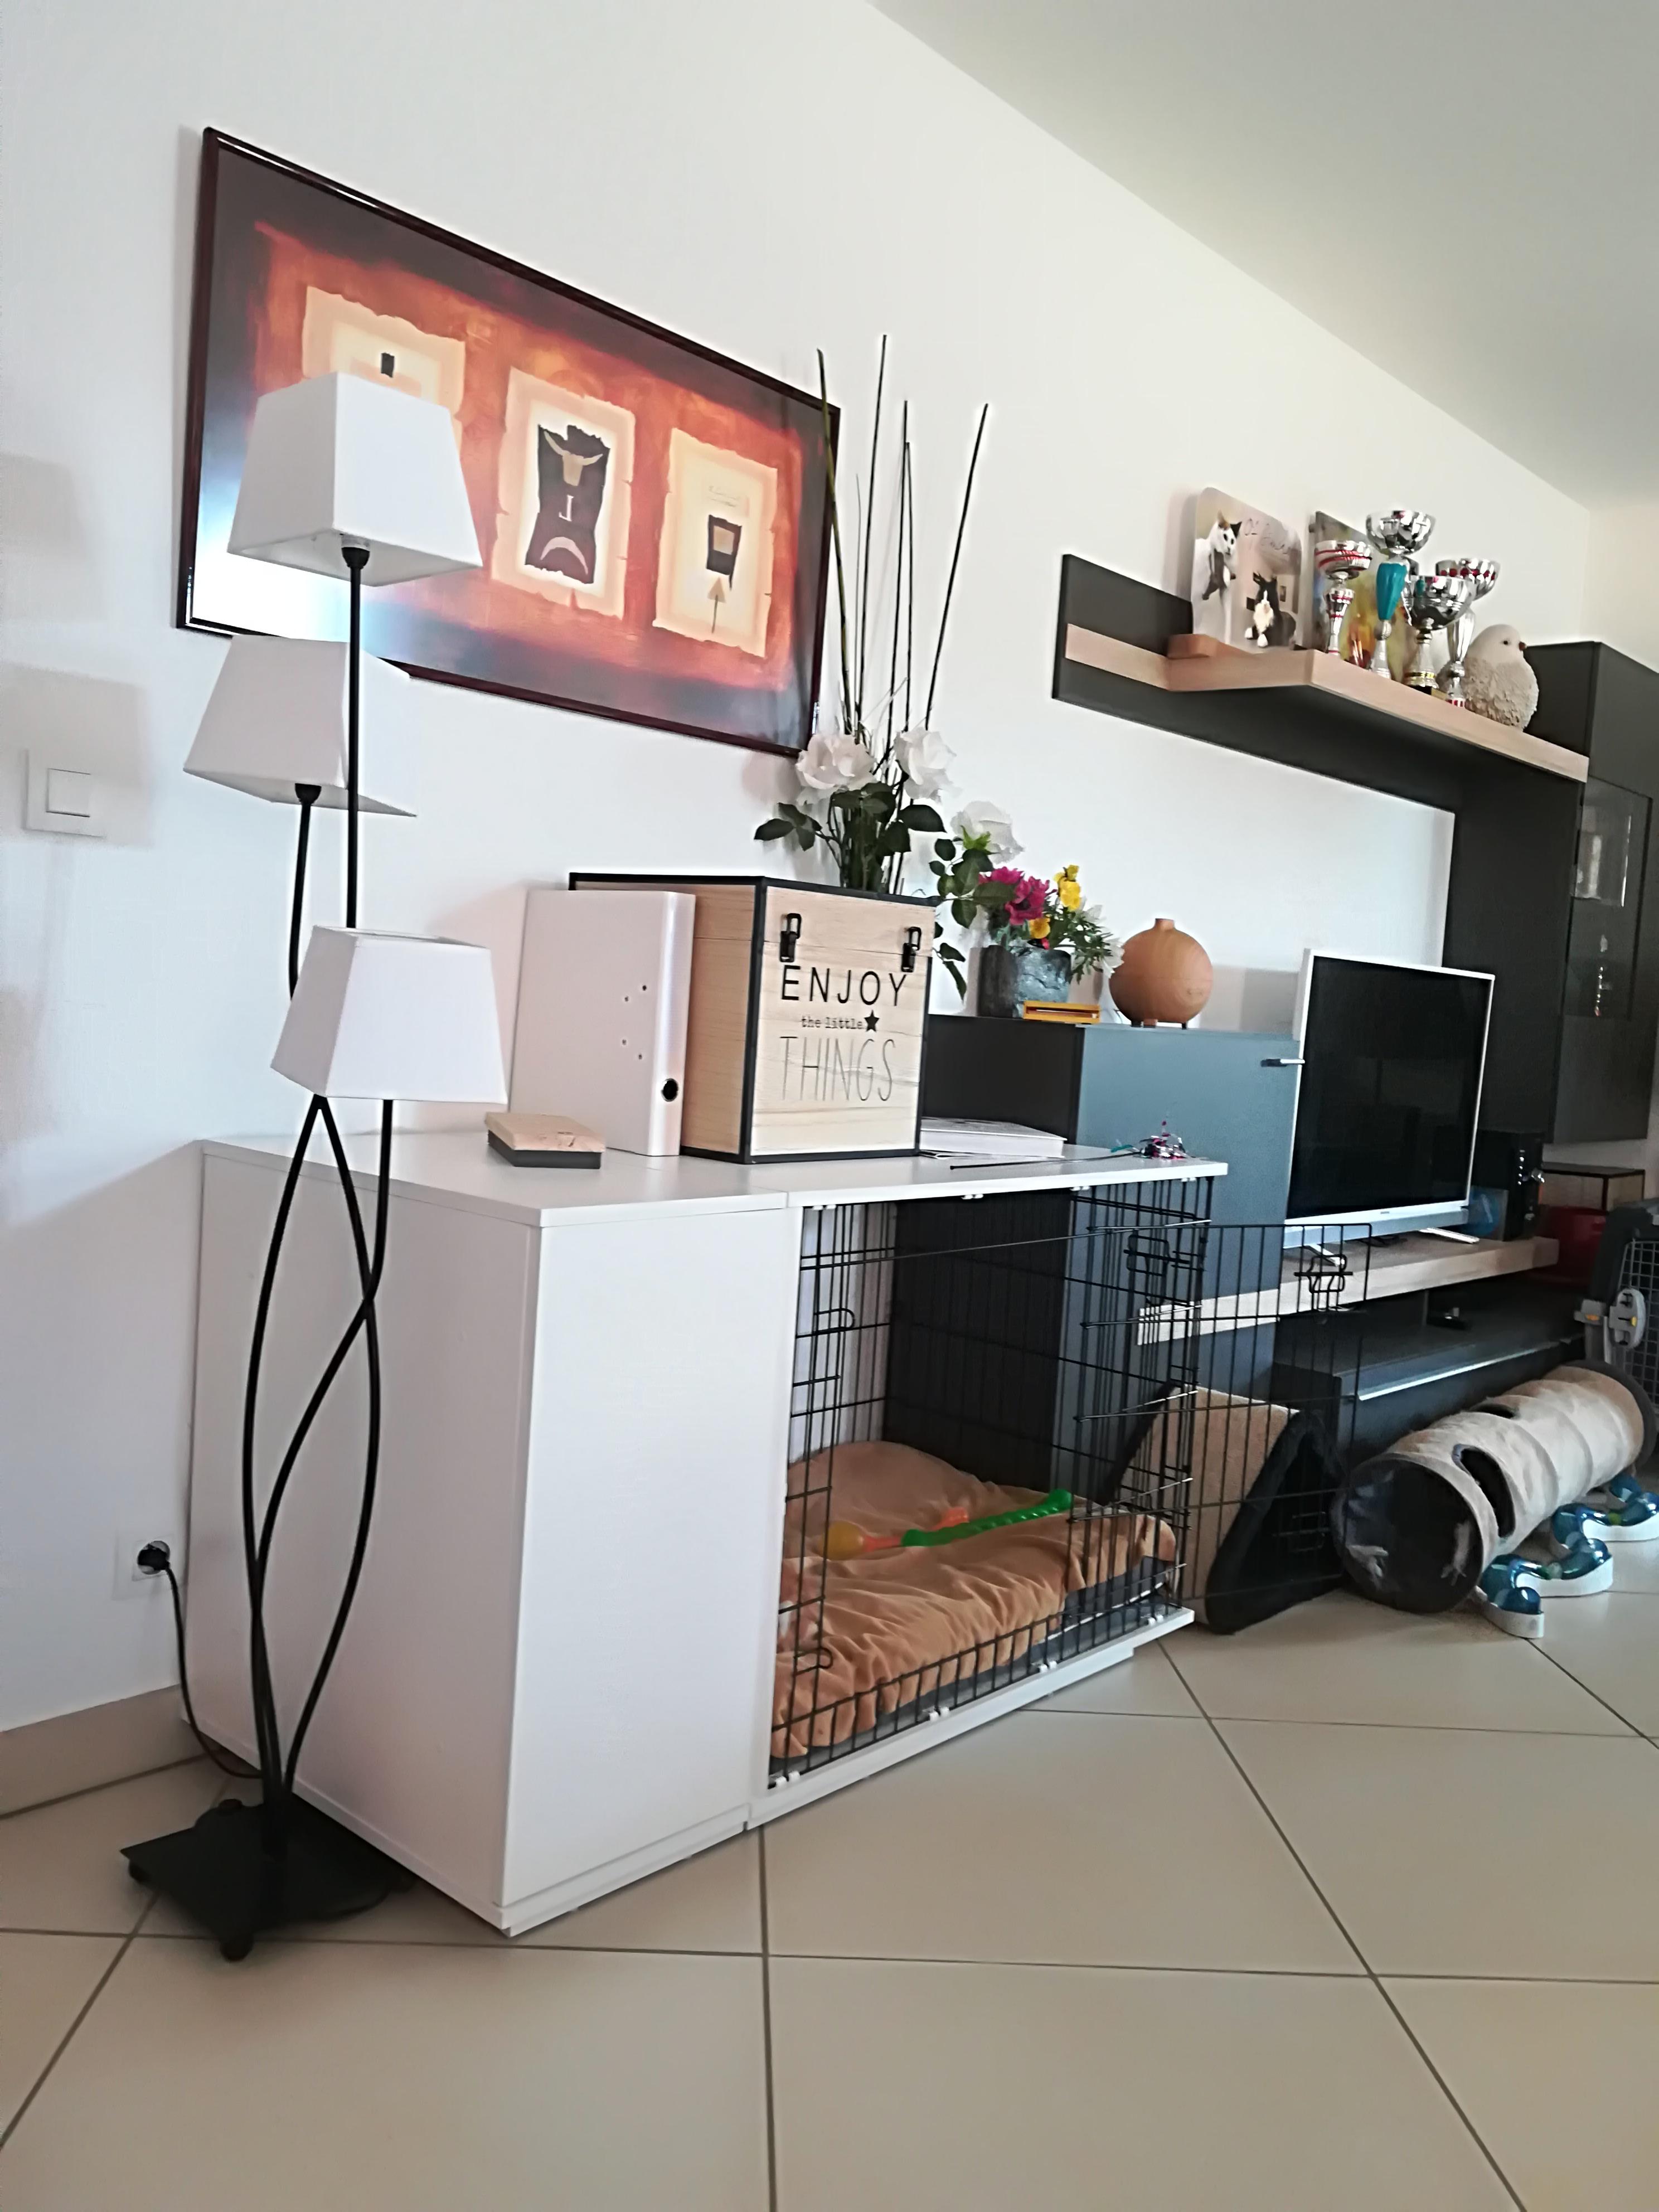 https://www.omlet.fr/images/originals/niche-fido-studio-notre-niche-fido-36-img-20180220-120009_0b3ada18.jpg